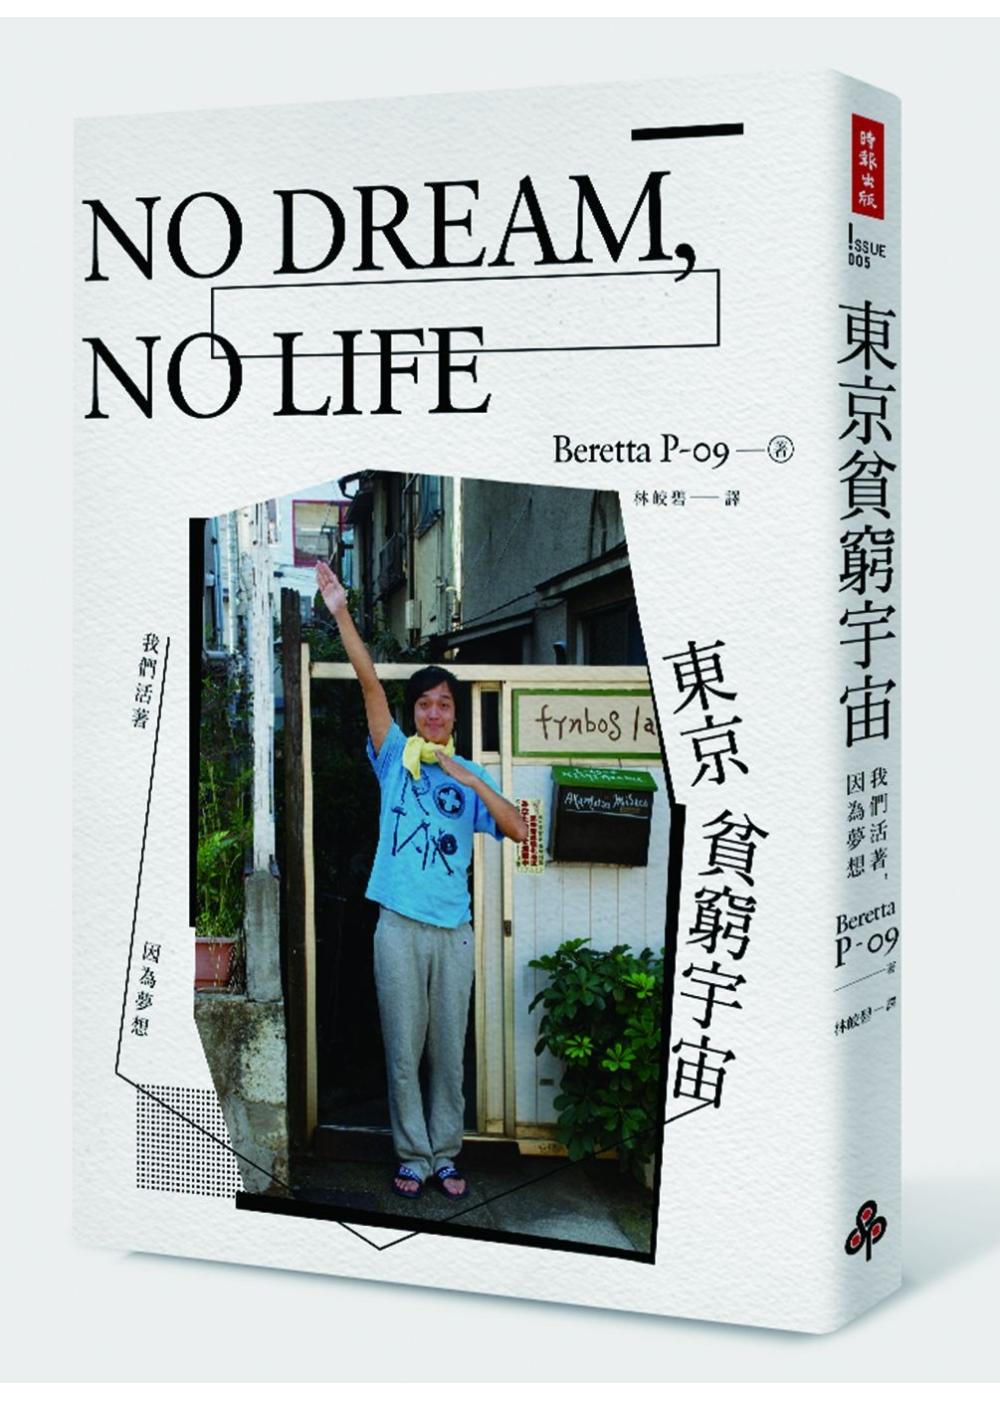 NO DREAM,NO LIFE:東京貧窮宇宙──我們活著,因為夢想